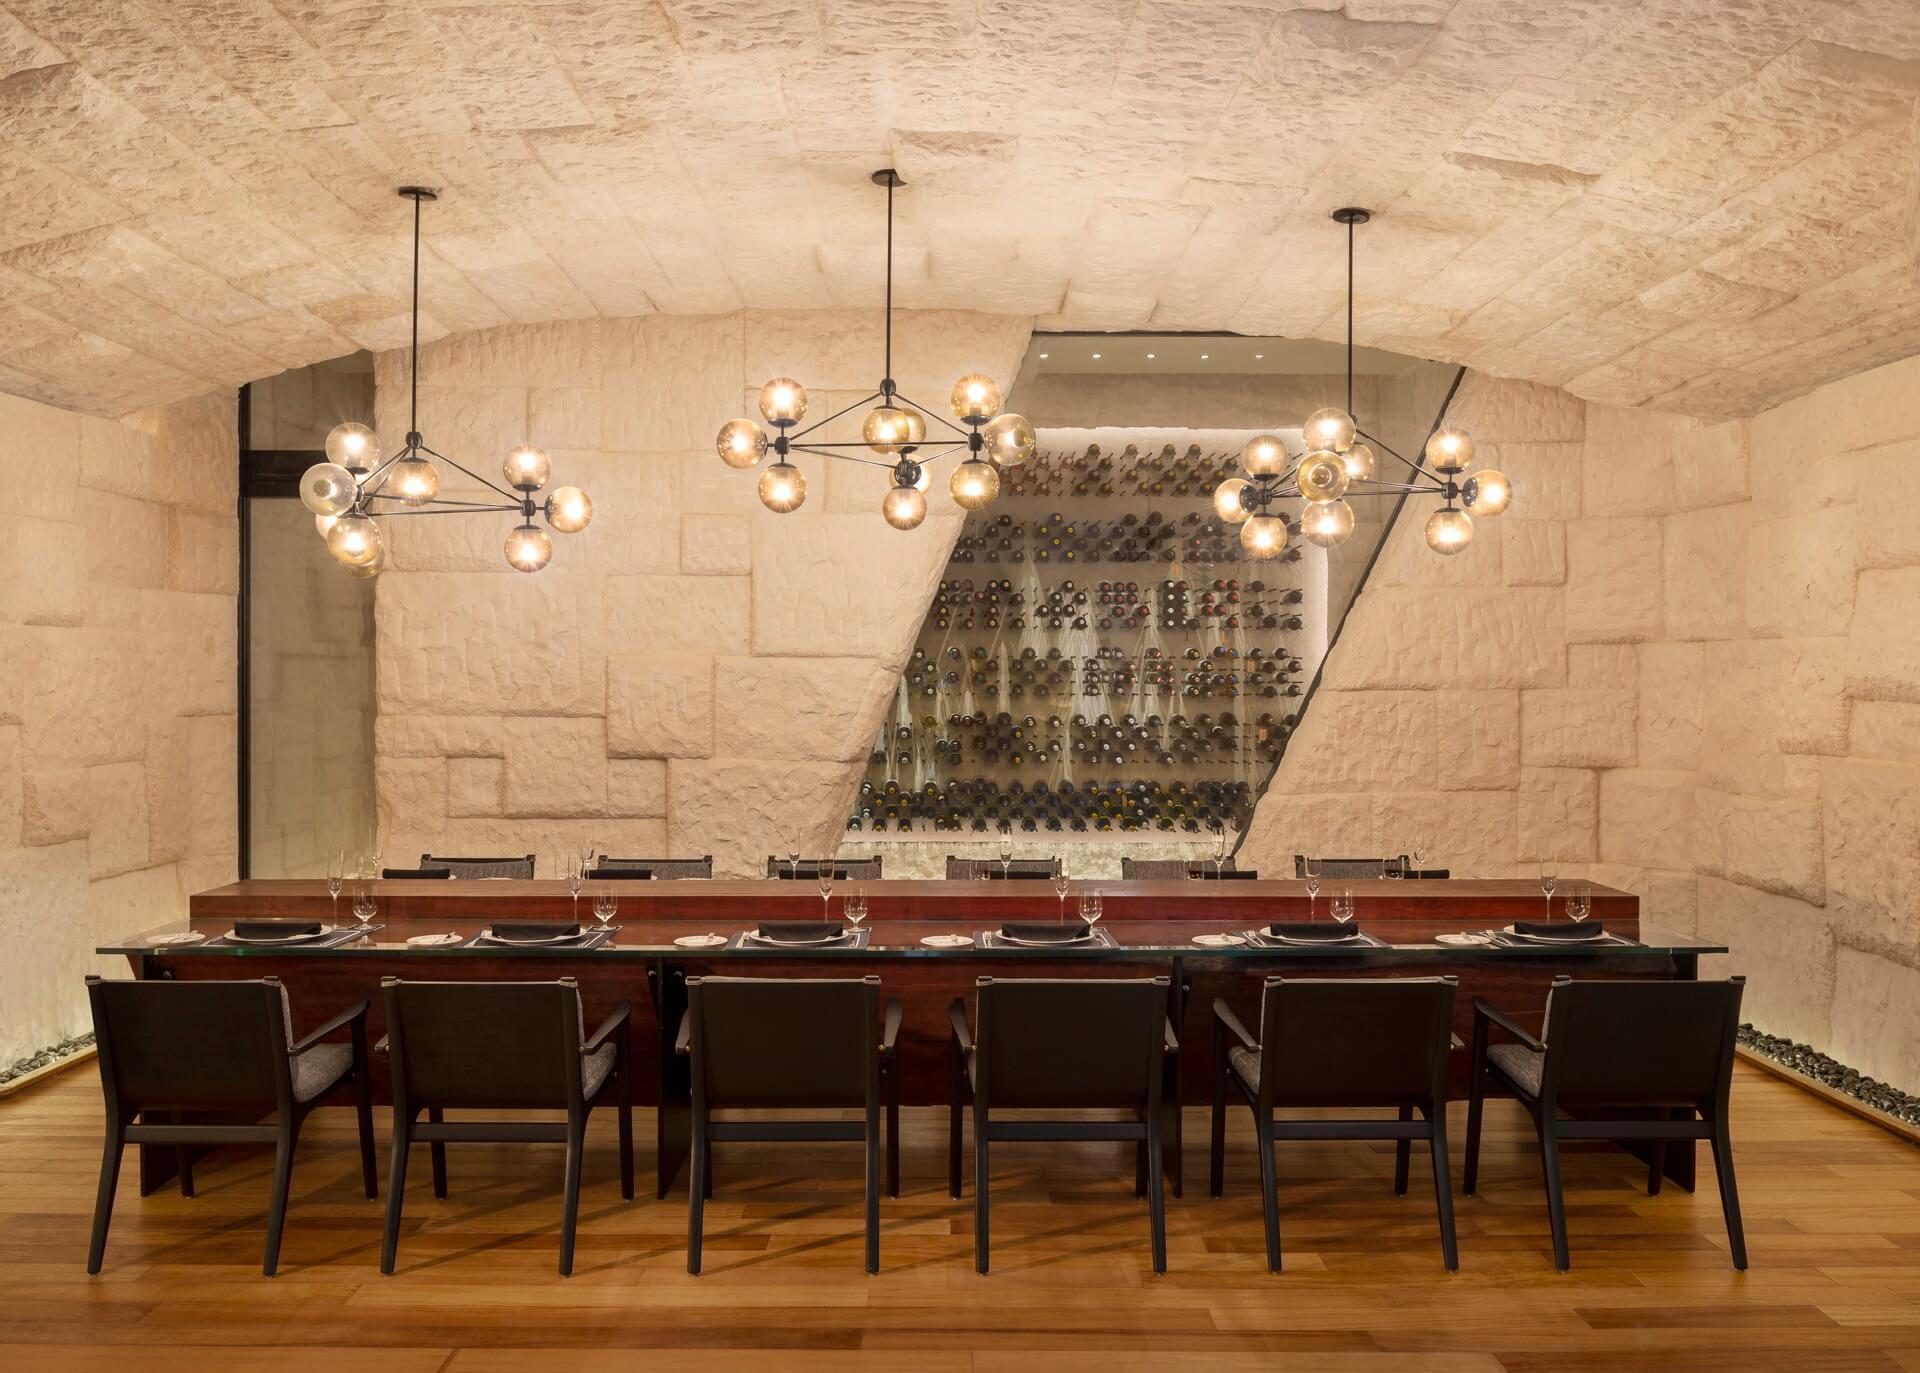 Wine Cellar with Rock Wall in Waldorf Astoria Maldives Hotel